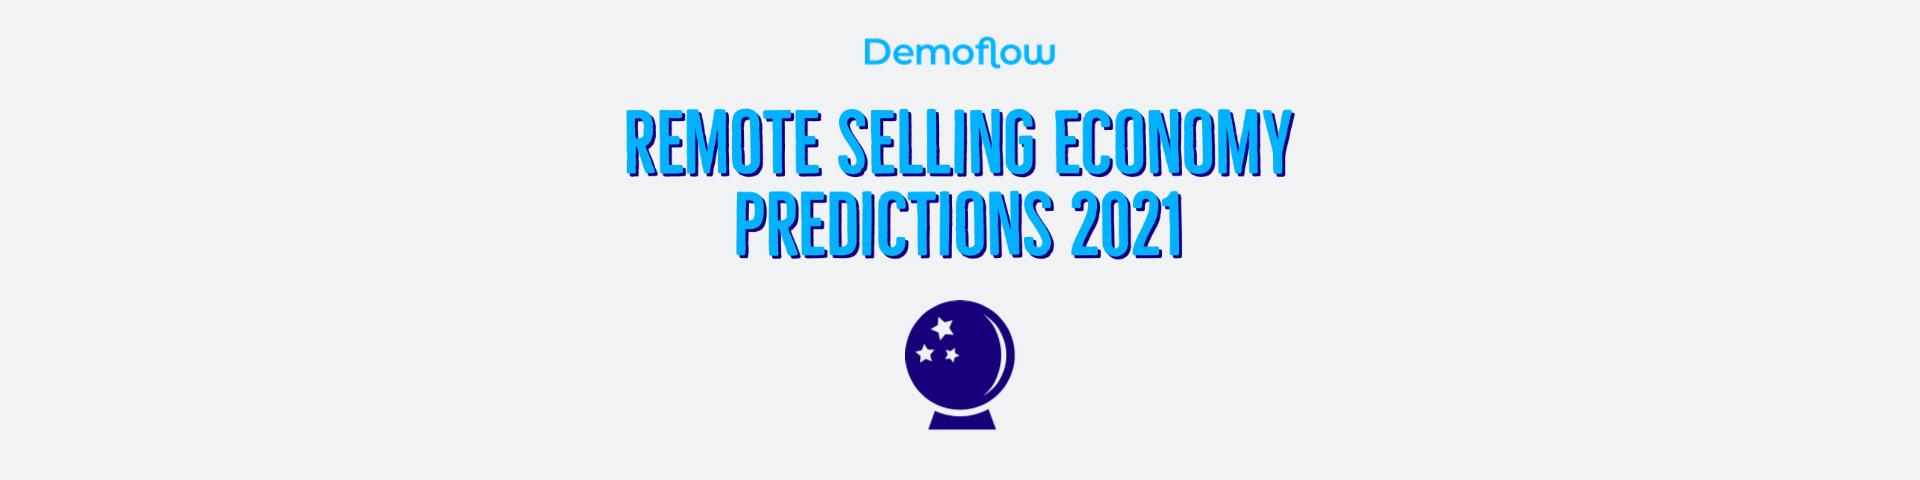 Remote Selling Economy Predictions 2021